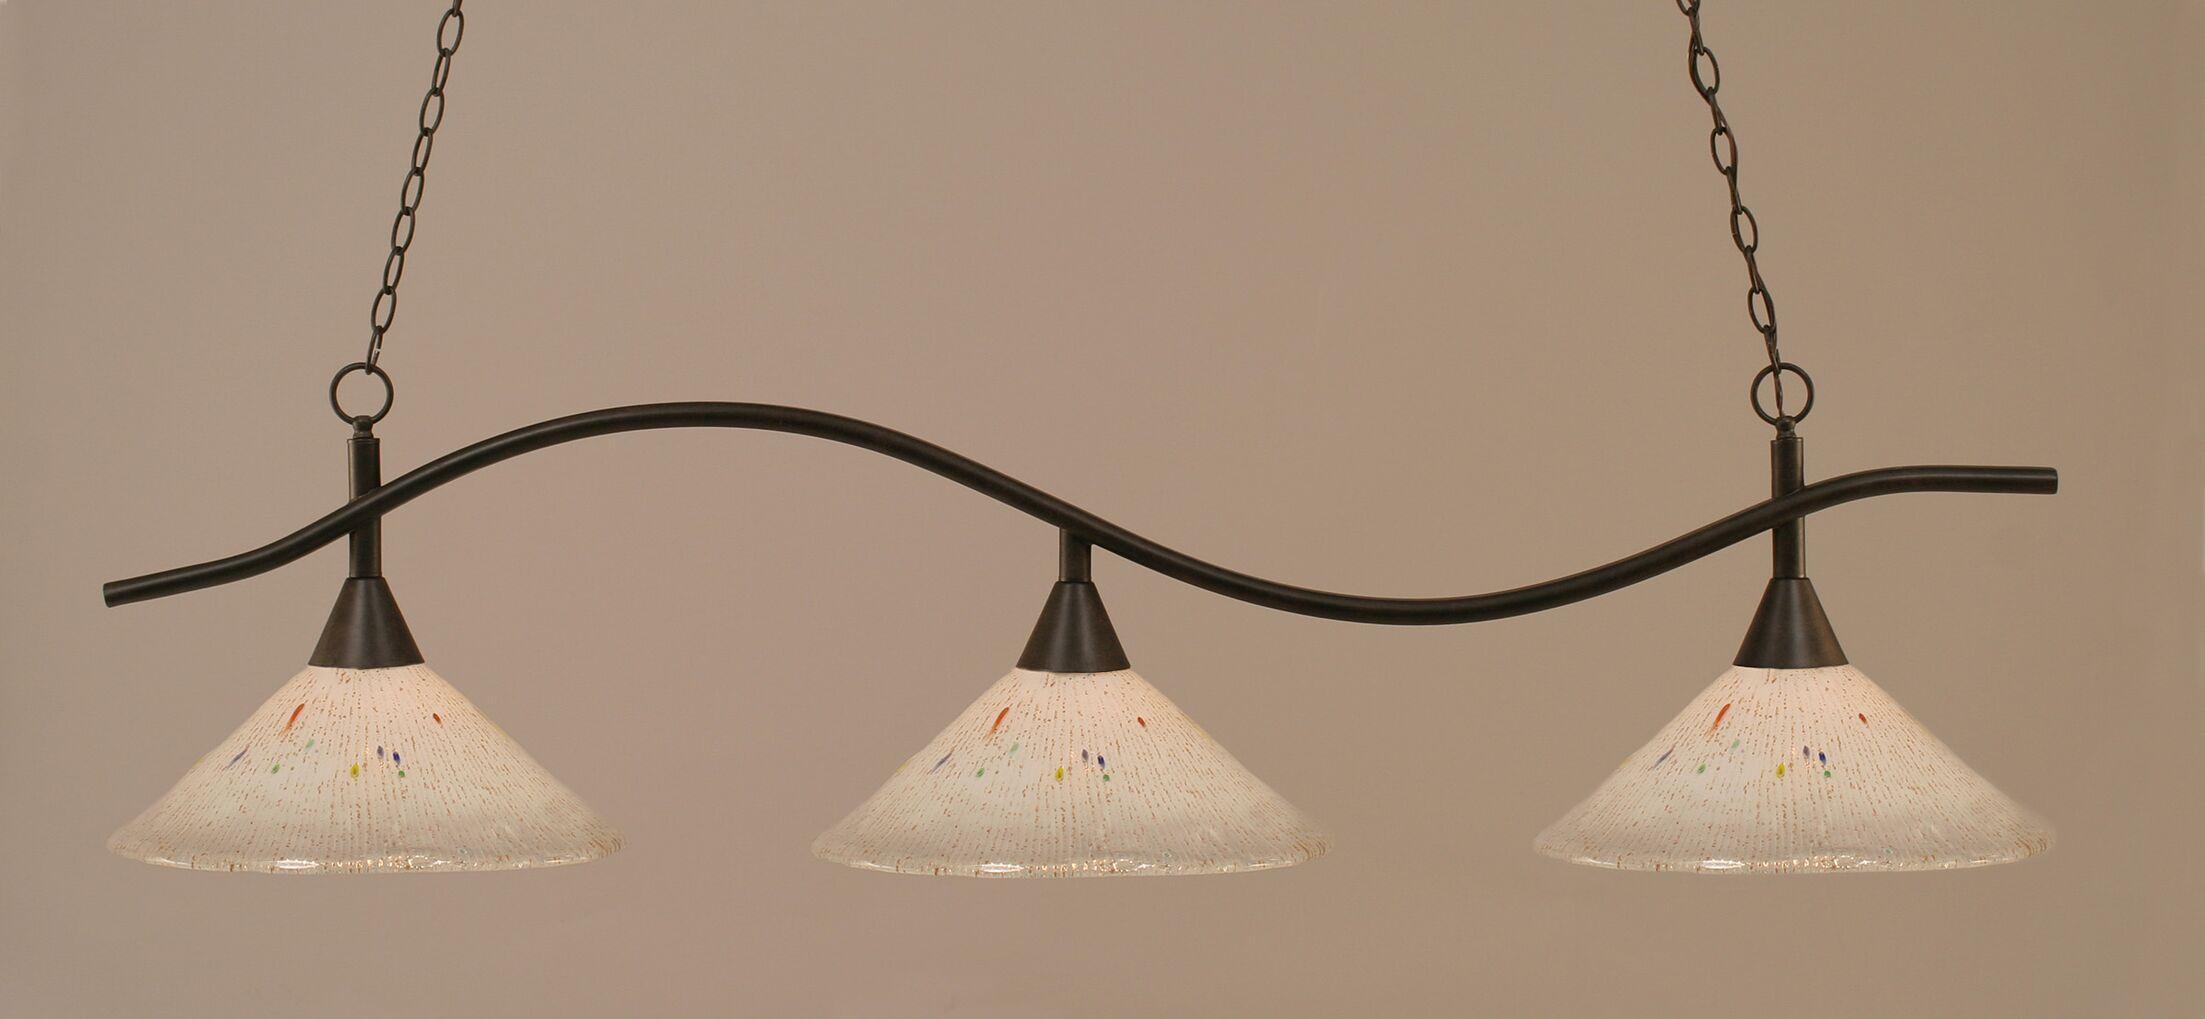 Demi 3-Light Kitchen Island Pendant Shade Color: Frosted, Finish: Dark Granite